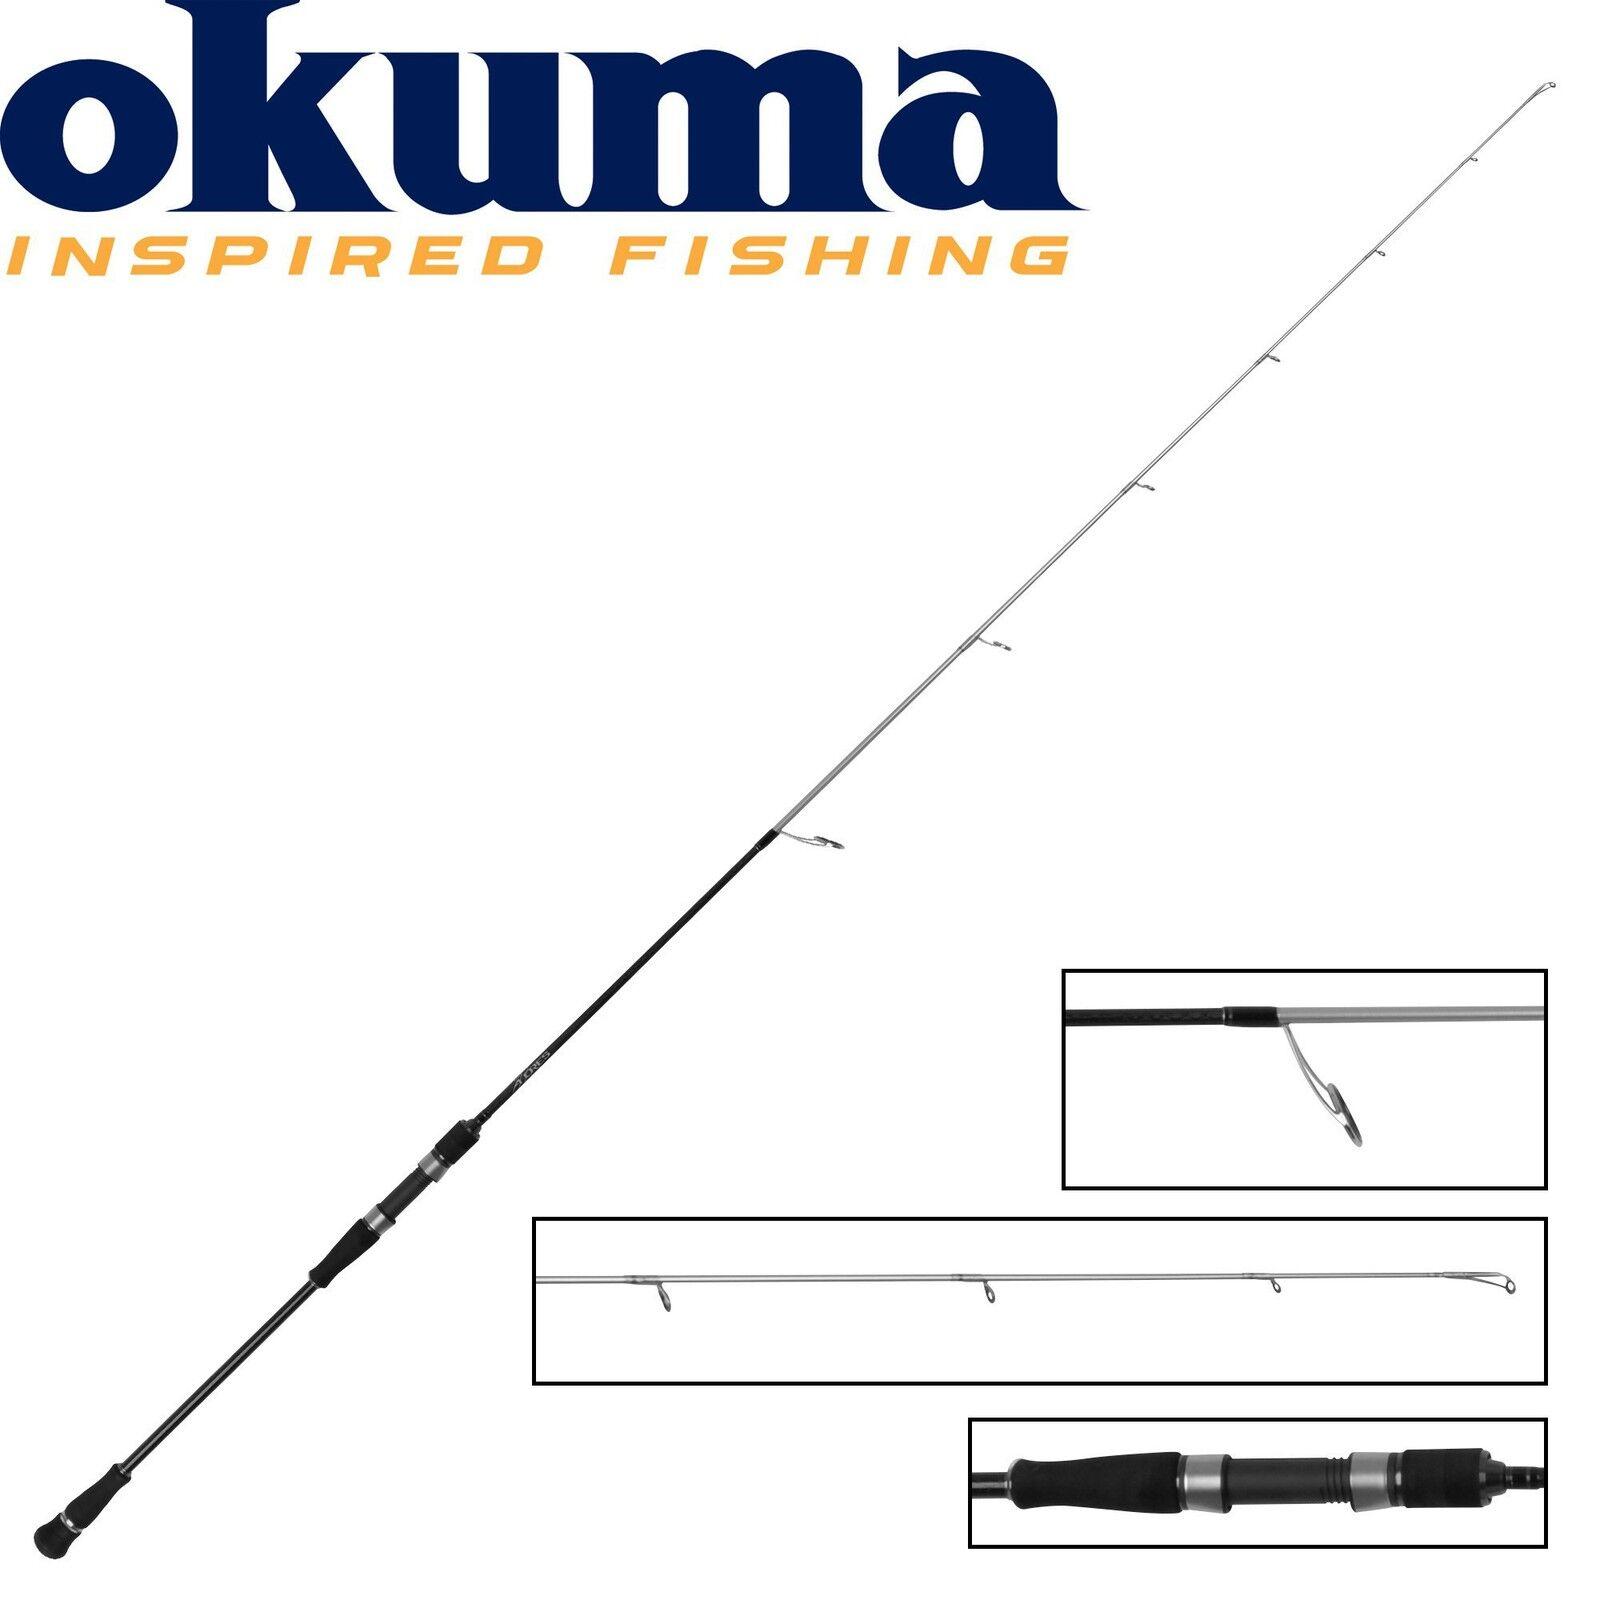 Okuma Azzores Slow Jig 203cm 20-90g Pilkrute Dänemark Norwegen Jiggen Jigrute